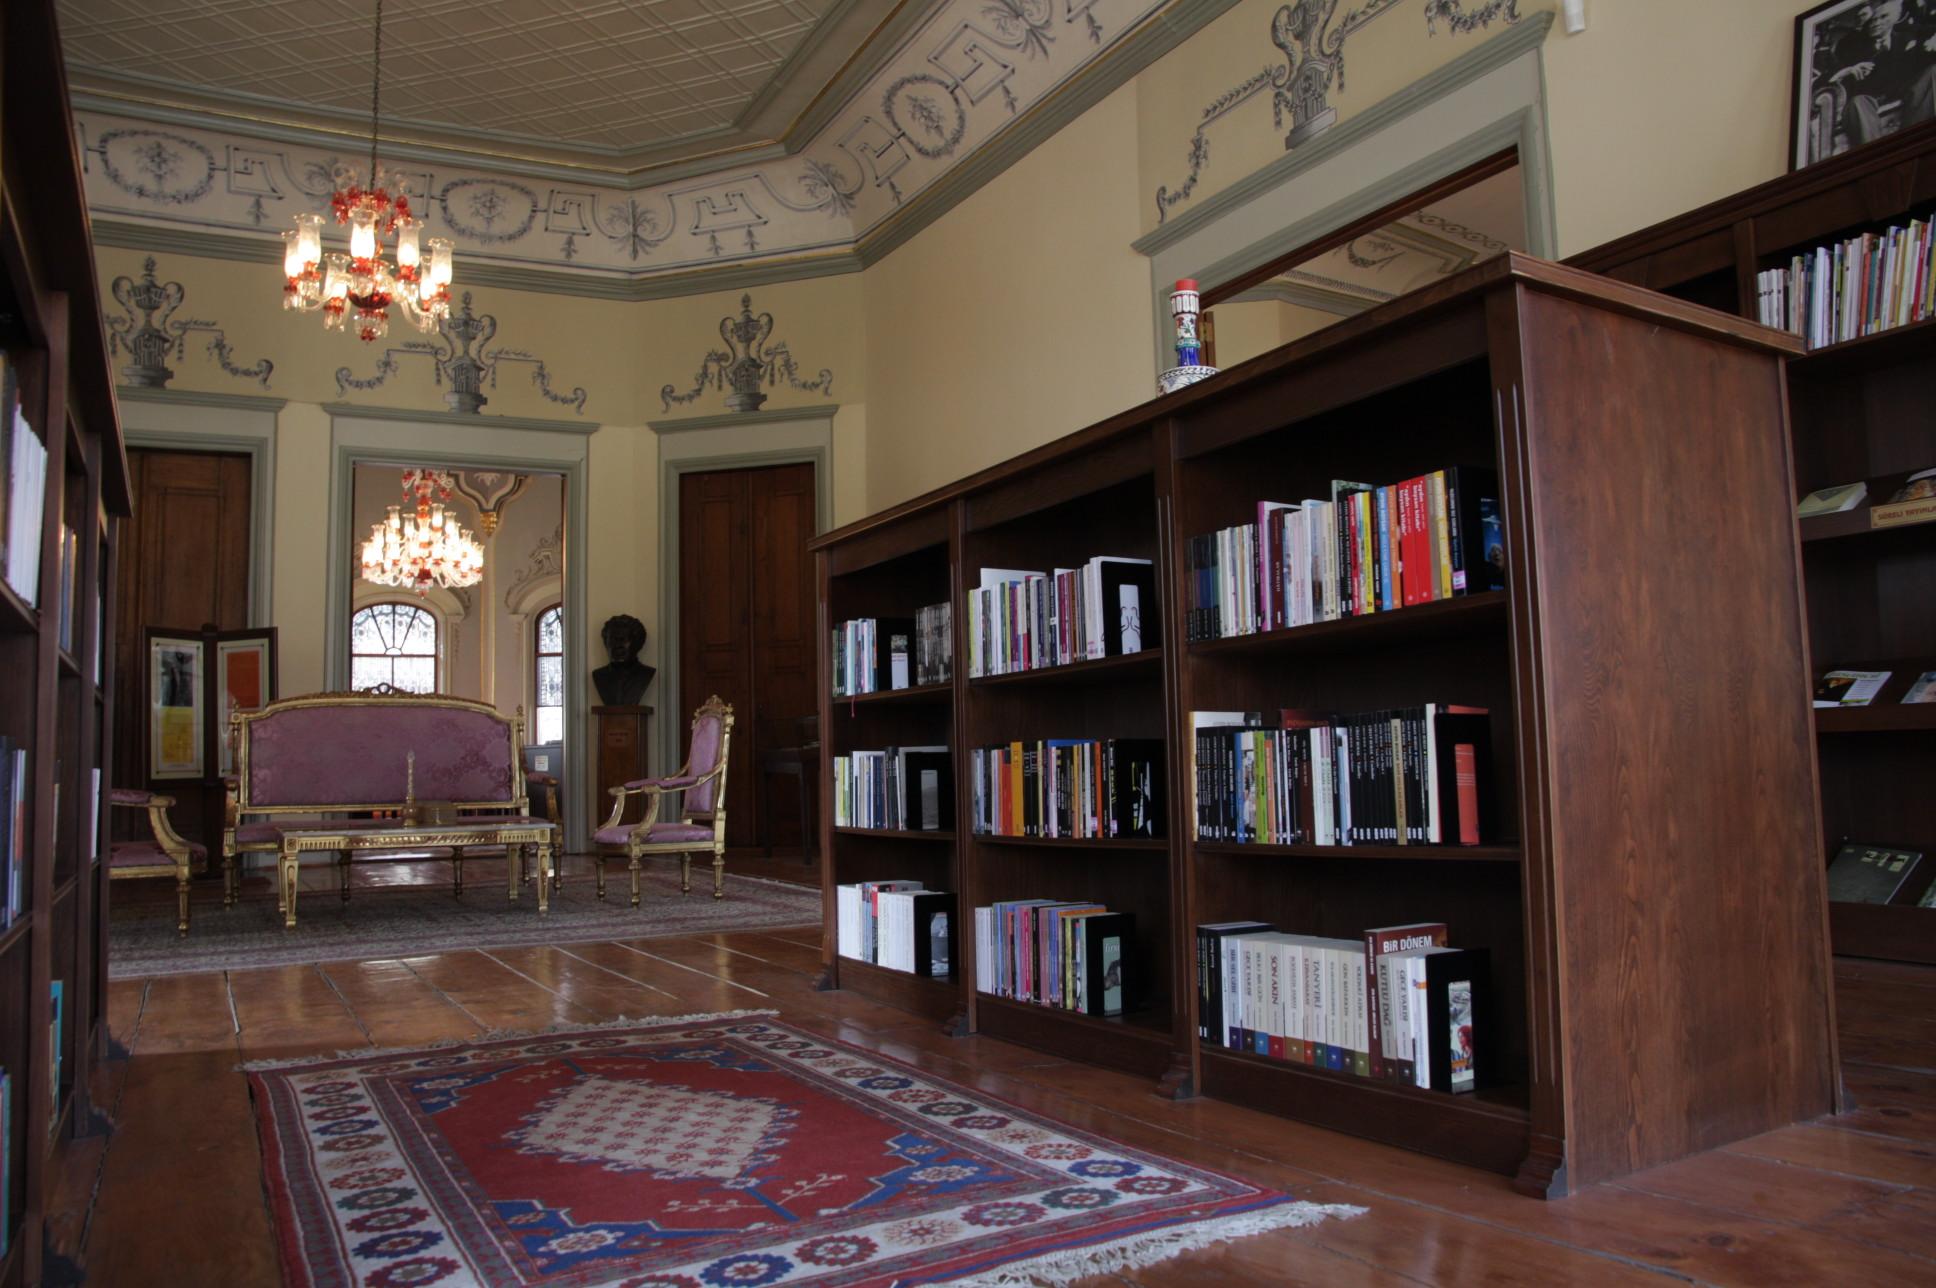 La bibliothèque (c) Erinç Salor